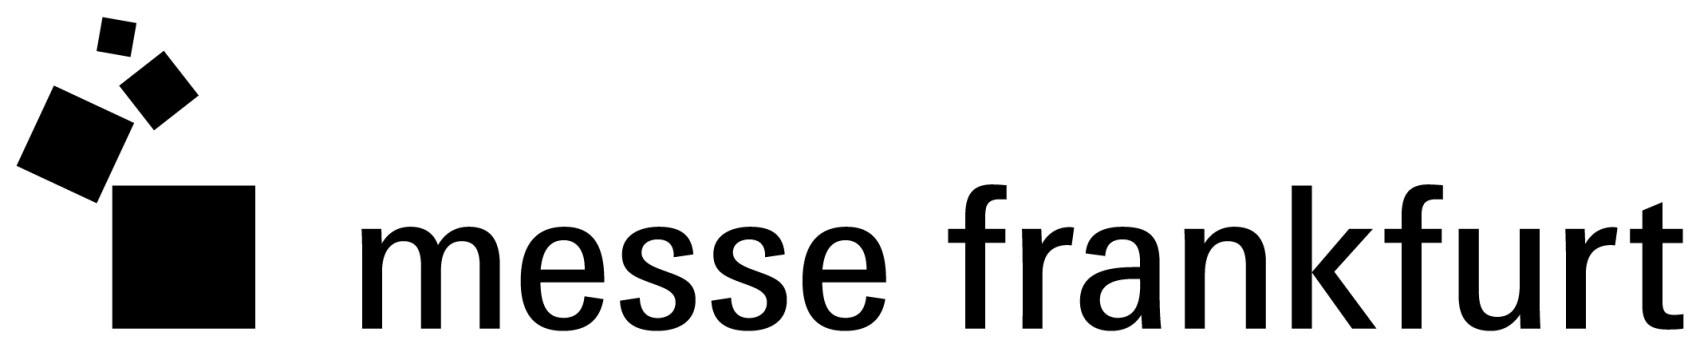 Logo Messe Frankfurt schwarz